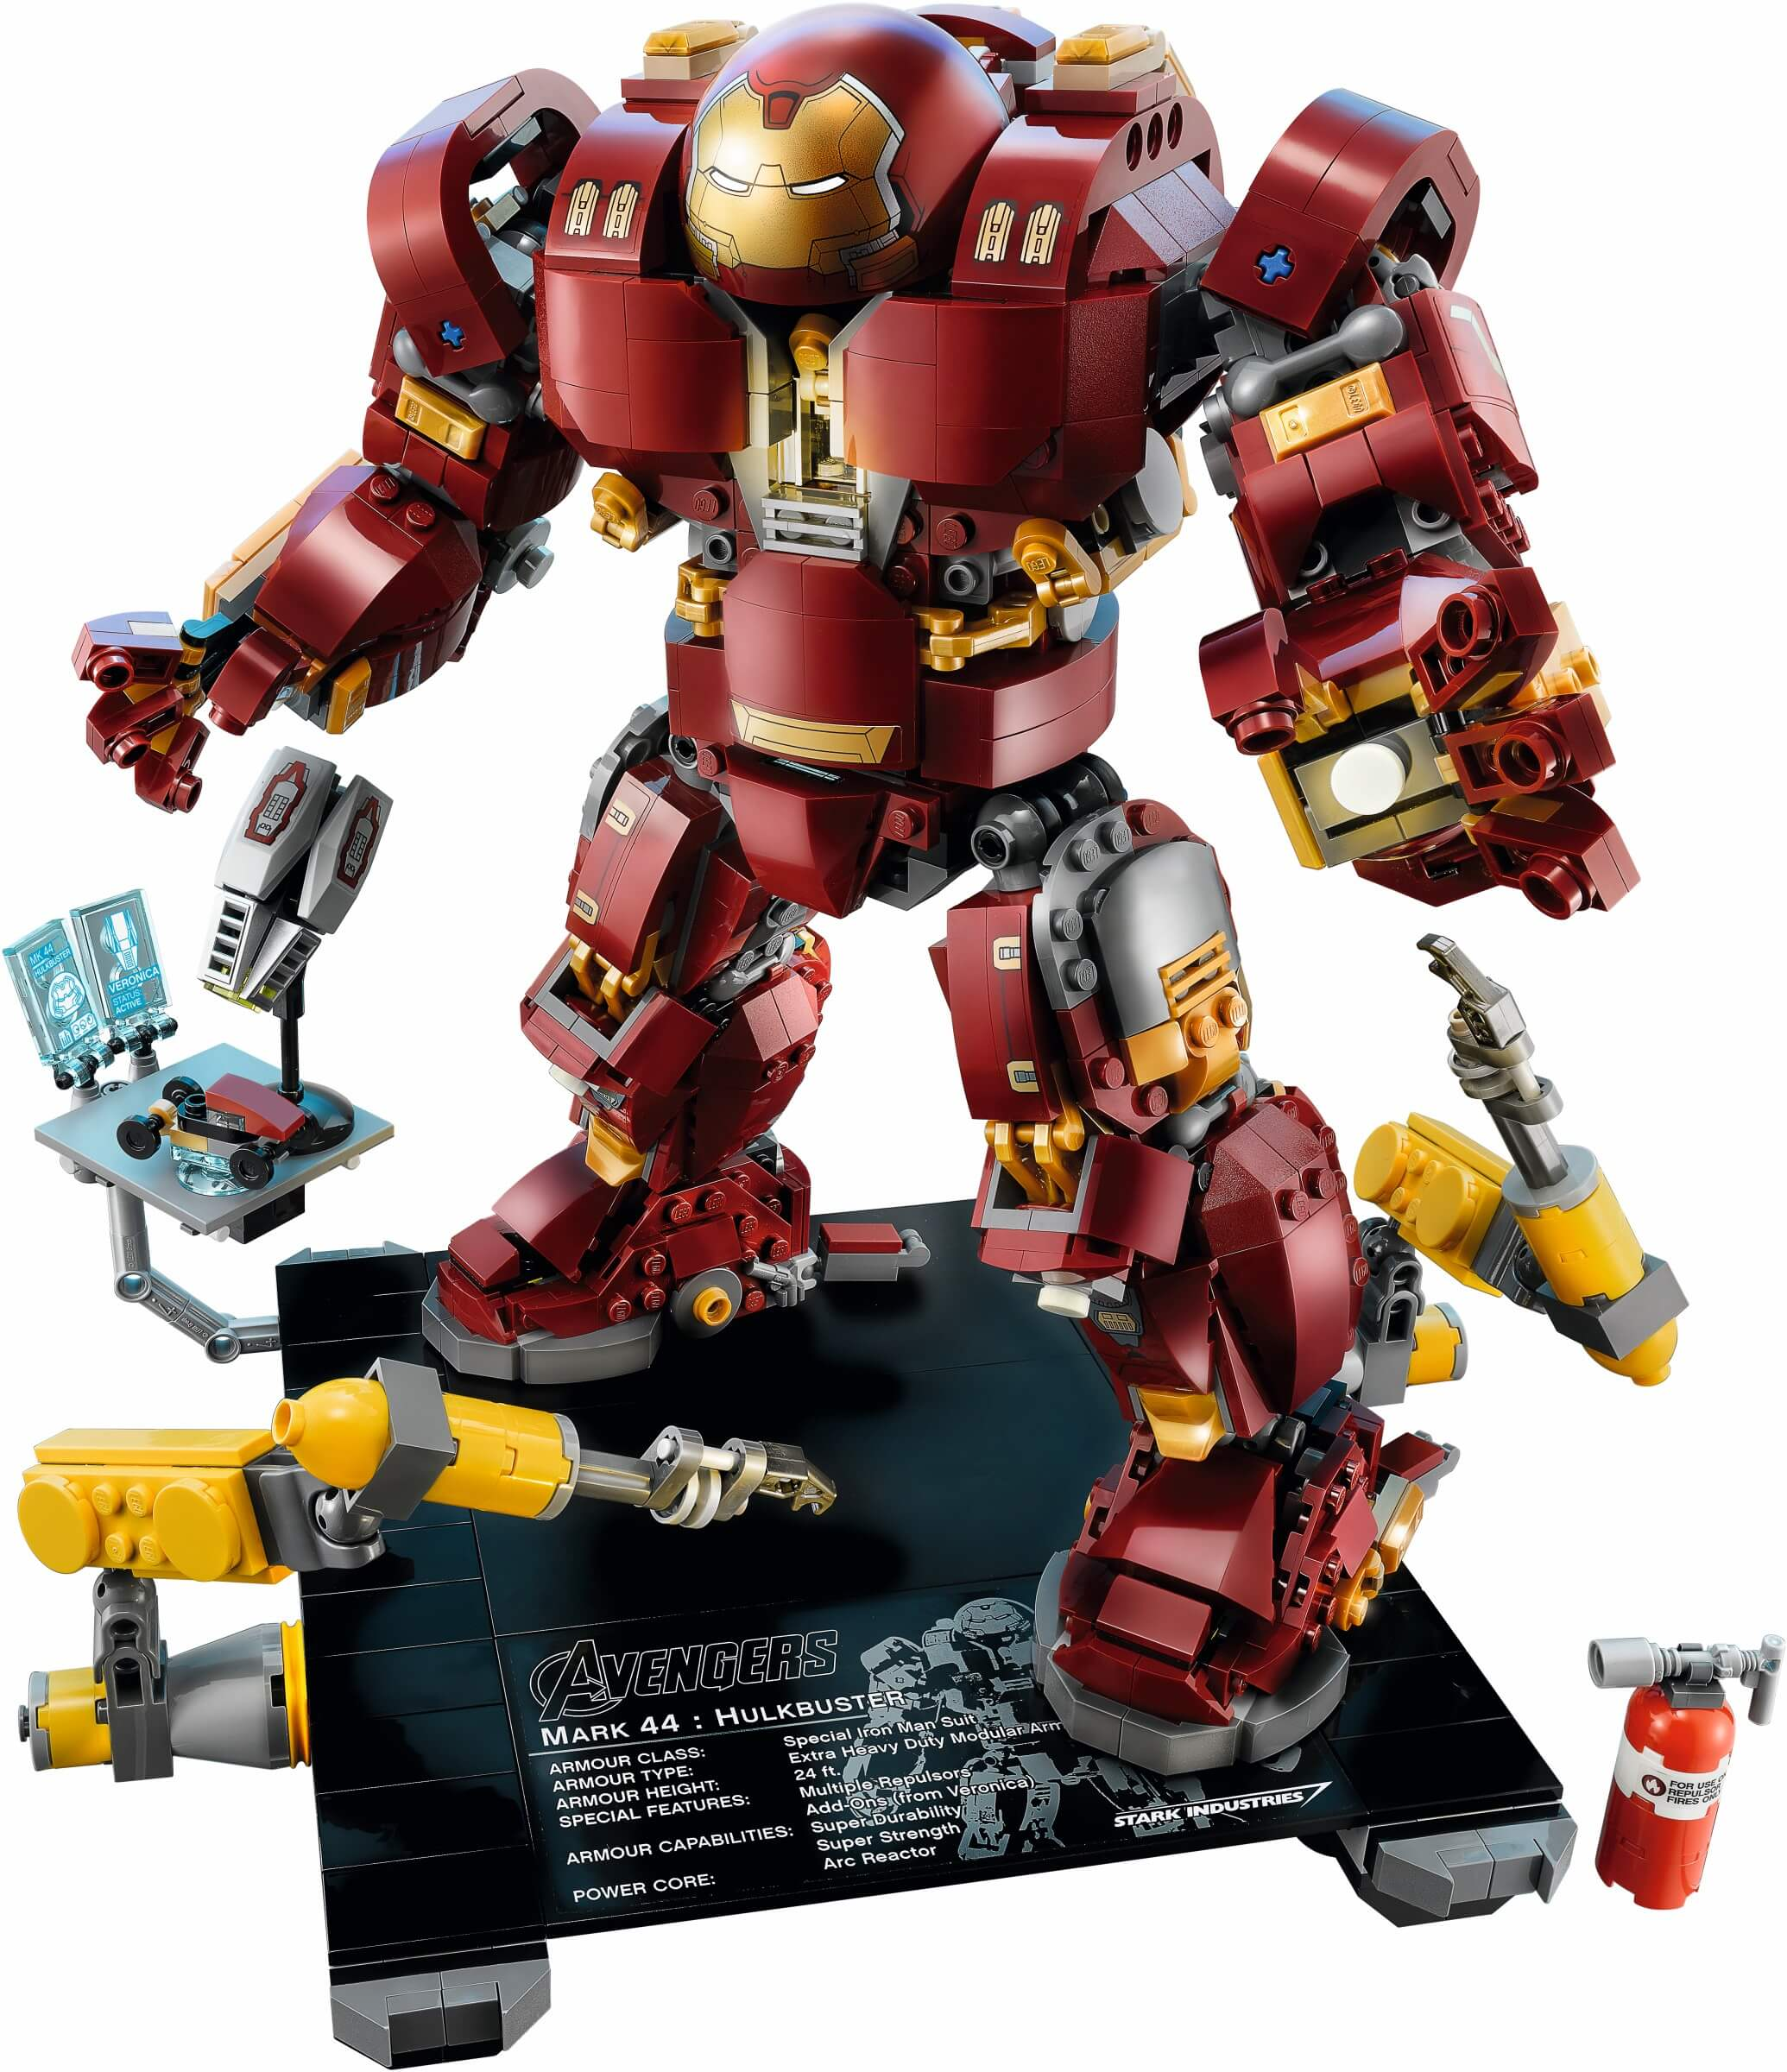 Mua đồ chơi LEGO 76105 - LEGO Marvel Super Heroes 76105 - Bộ Giáp Hulkbuster: Phiên bản Ultron (LEGO Marvel Super Heroes 76105 The Hulkbuster: Ultron Edition)